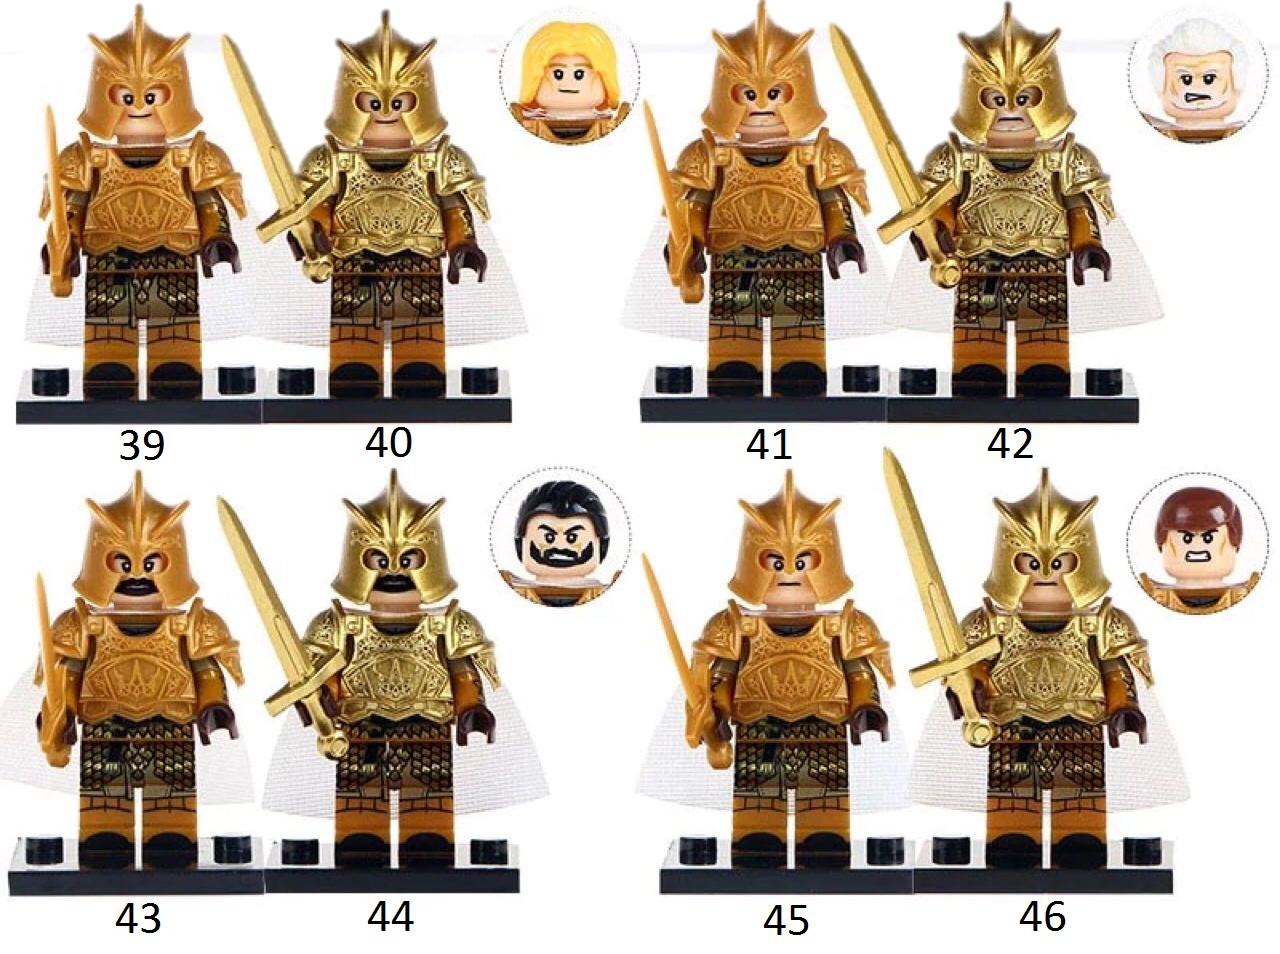 Фигурки Лего lego игра престолов game of throne рыцари солдаты армия